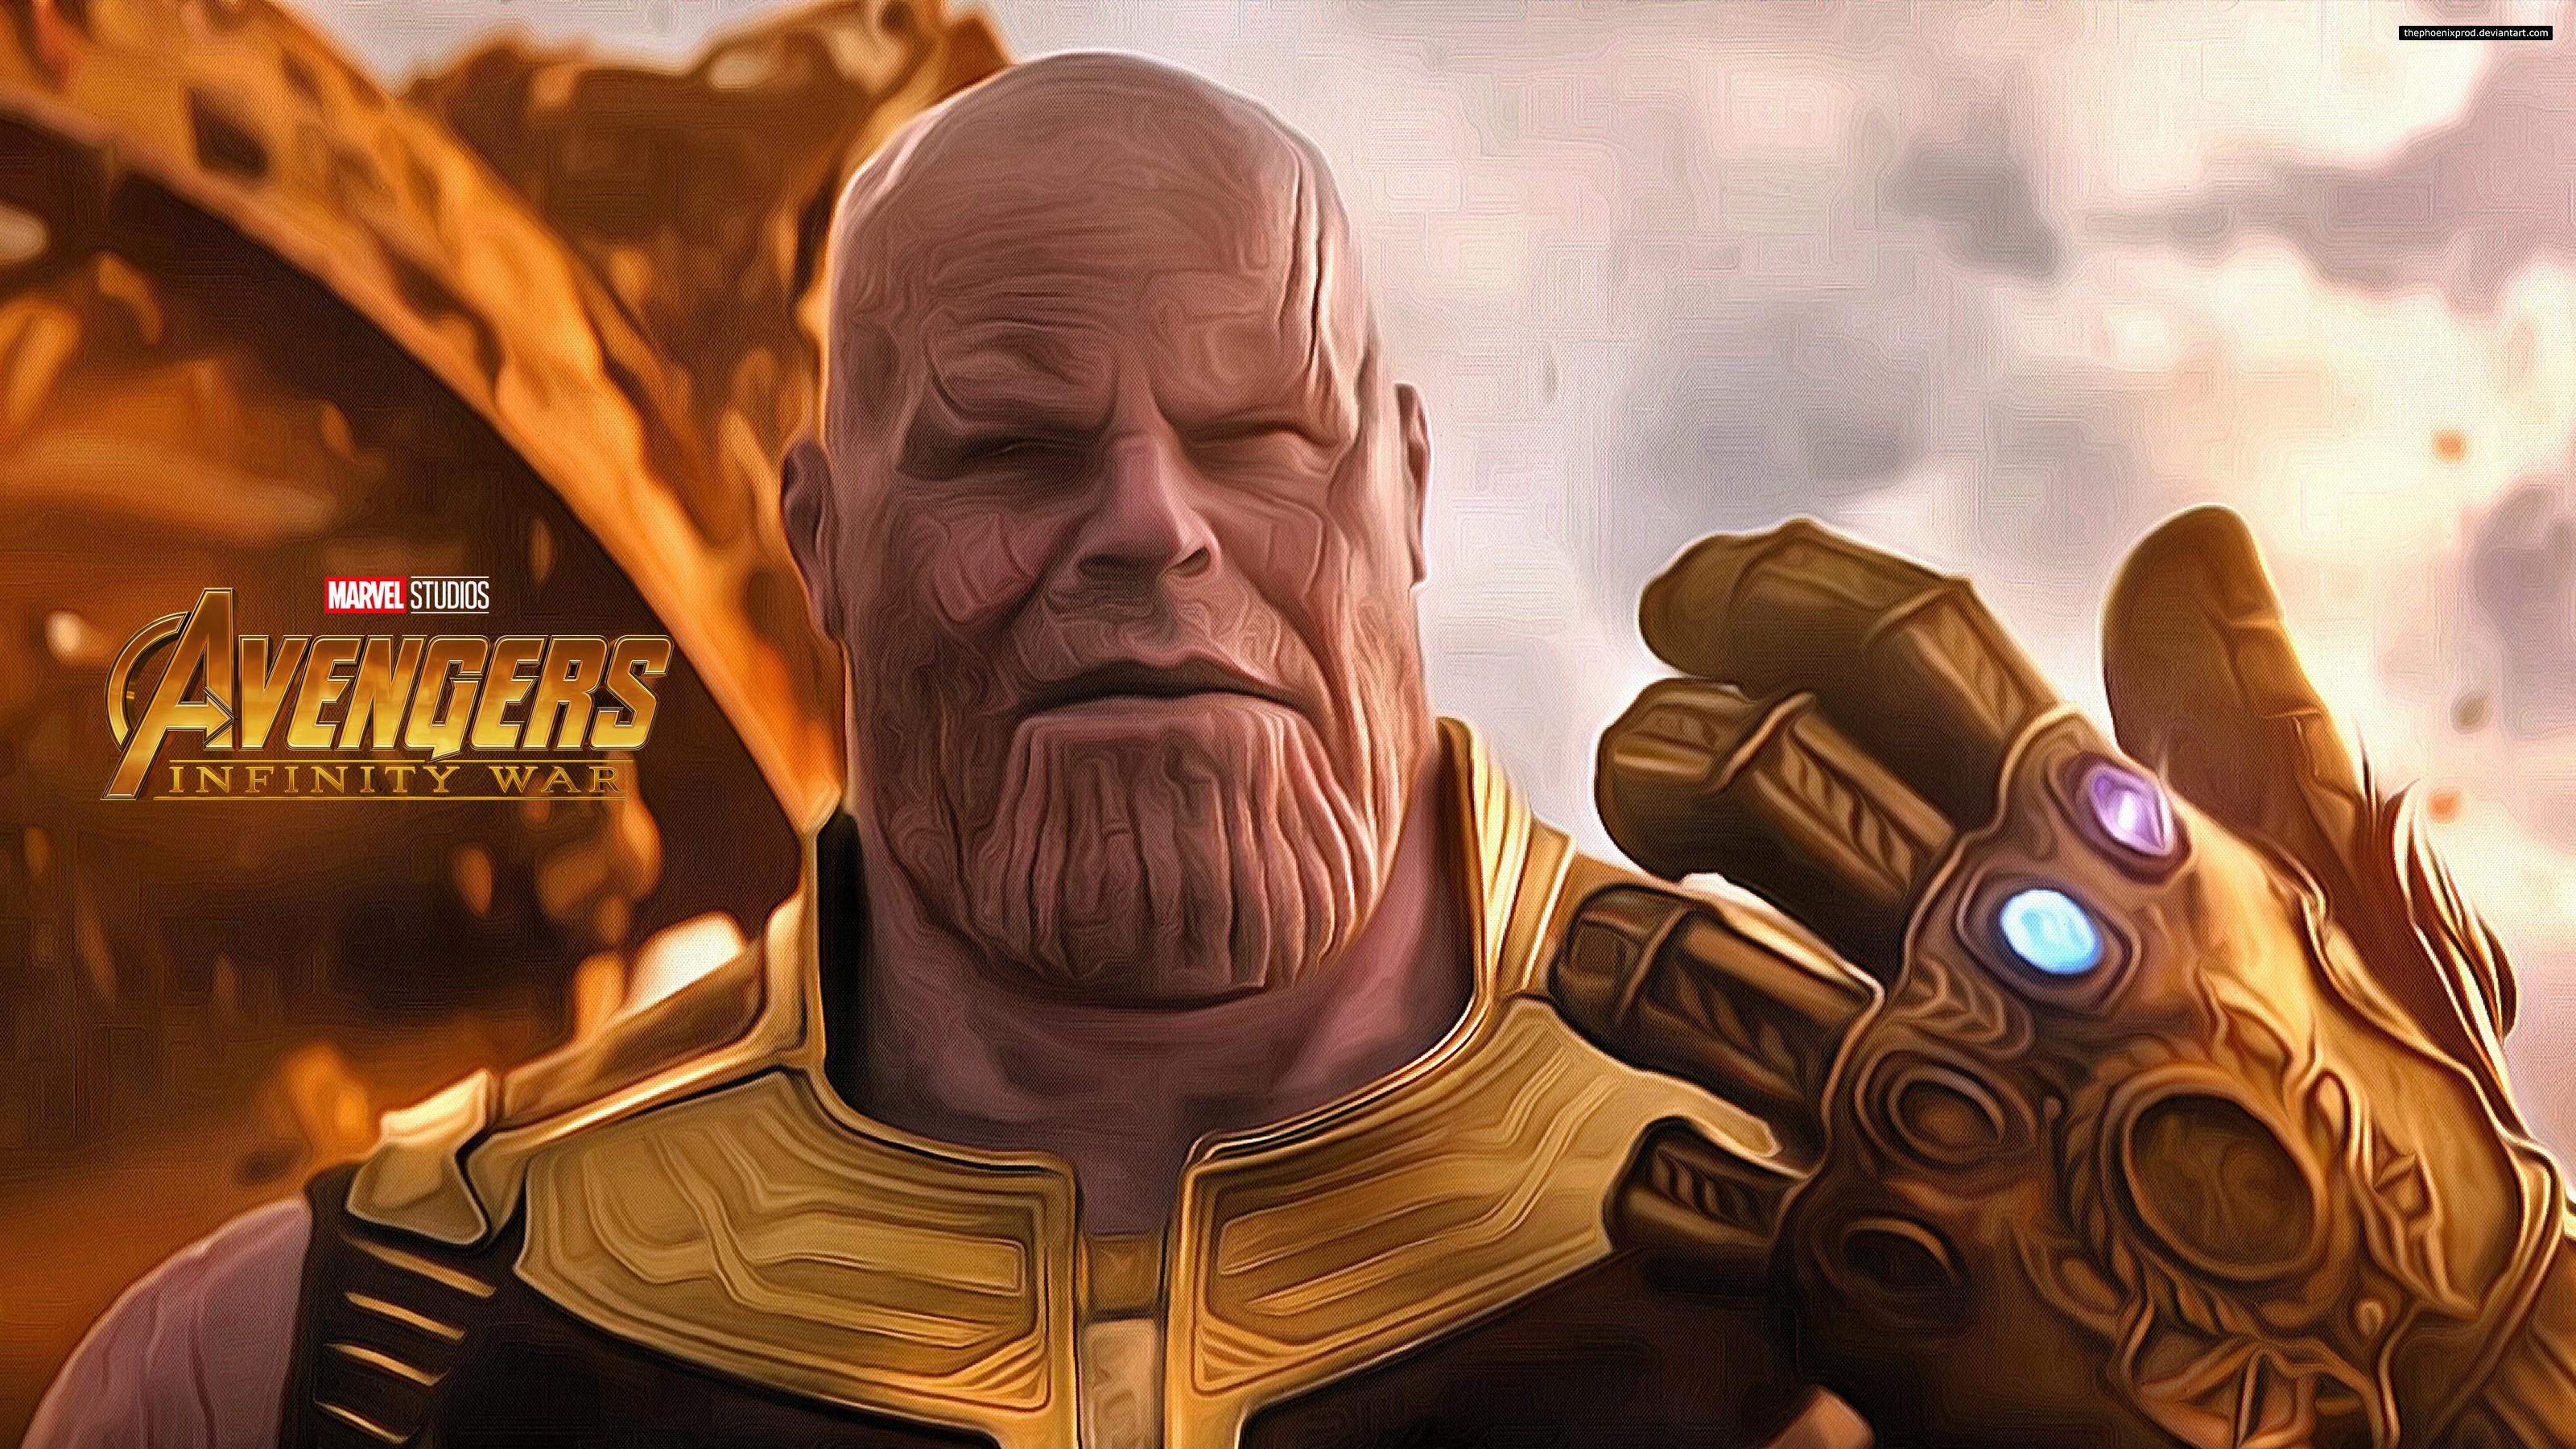 Avengers 3 Infinity War Thanos 4k Wallpaper By Thephoenixprod On Deviantart